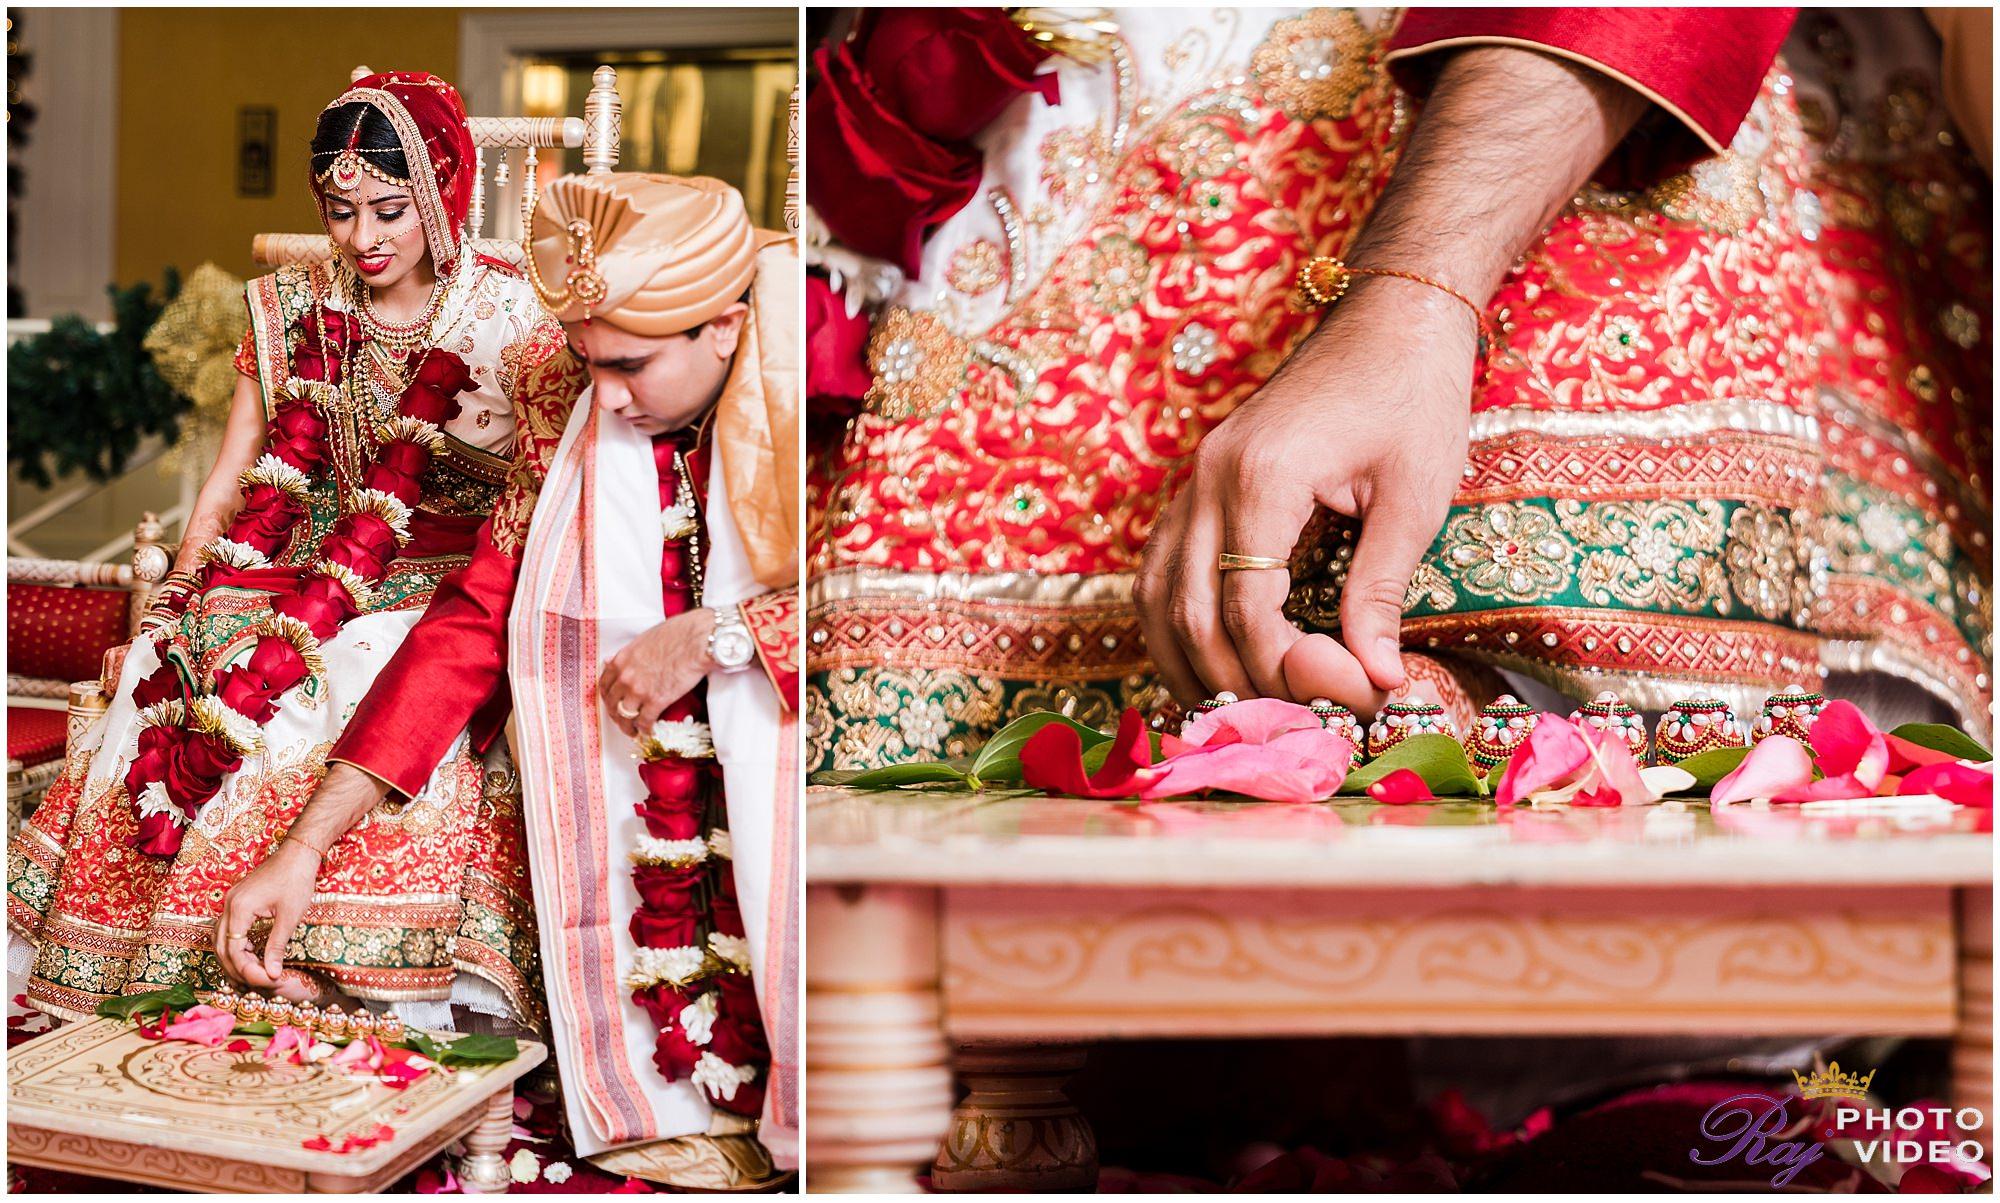 Founders-Inn-and-Spa-Virginia-Beach-VA-Indian-Wedding-Harini-Vivek-46.jpg